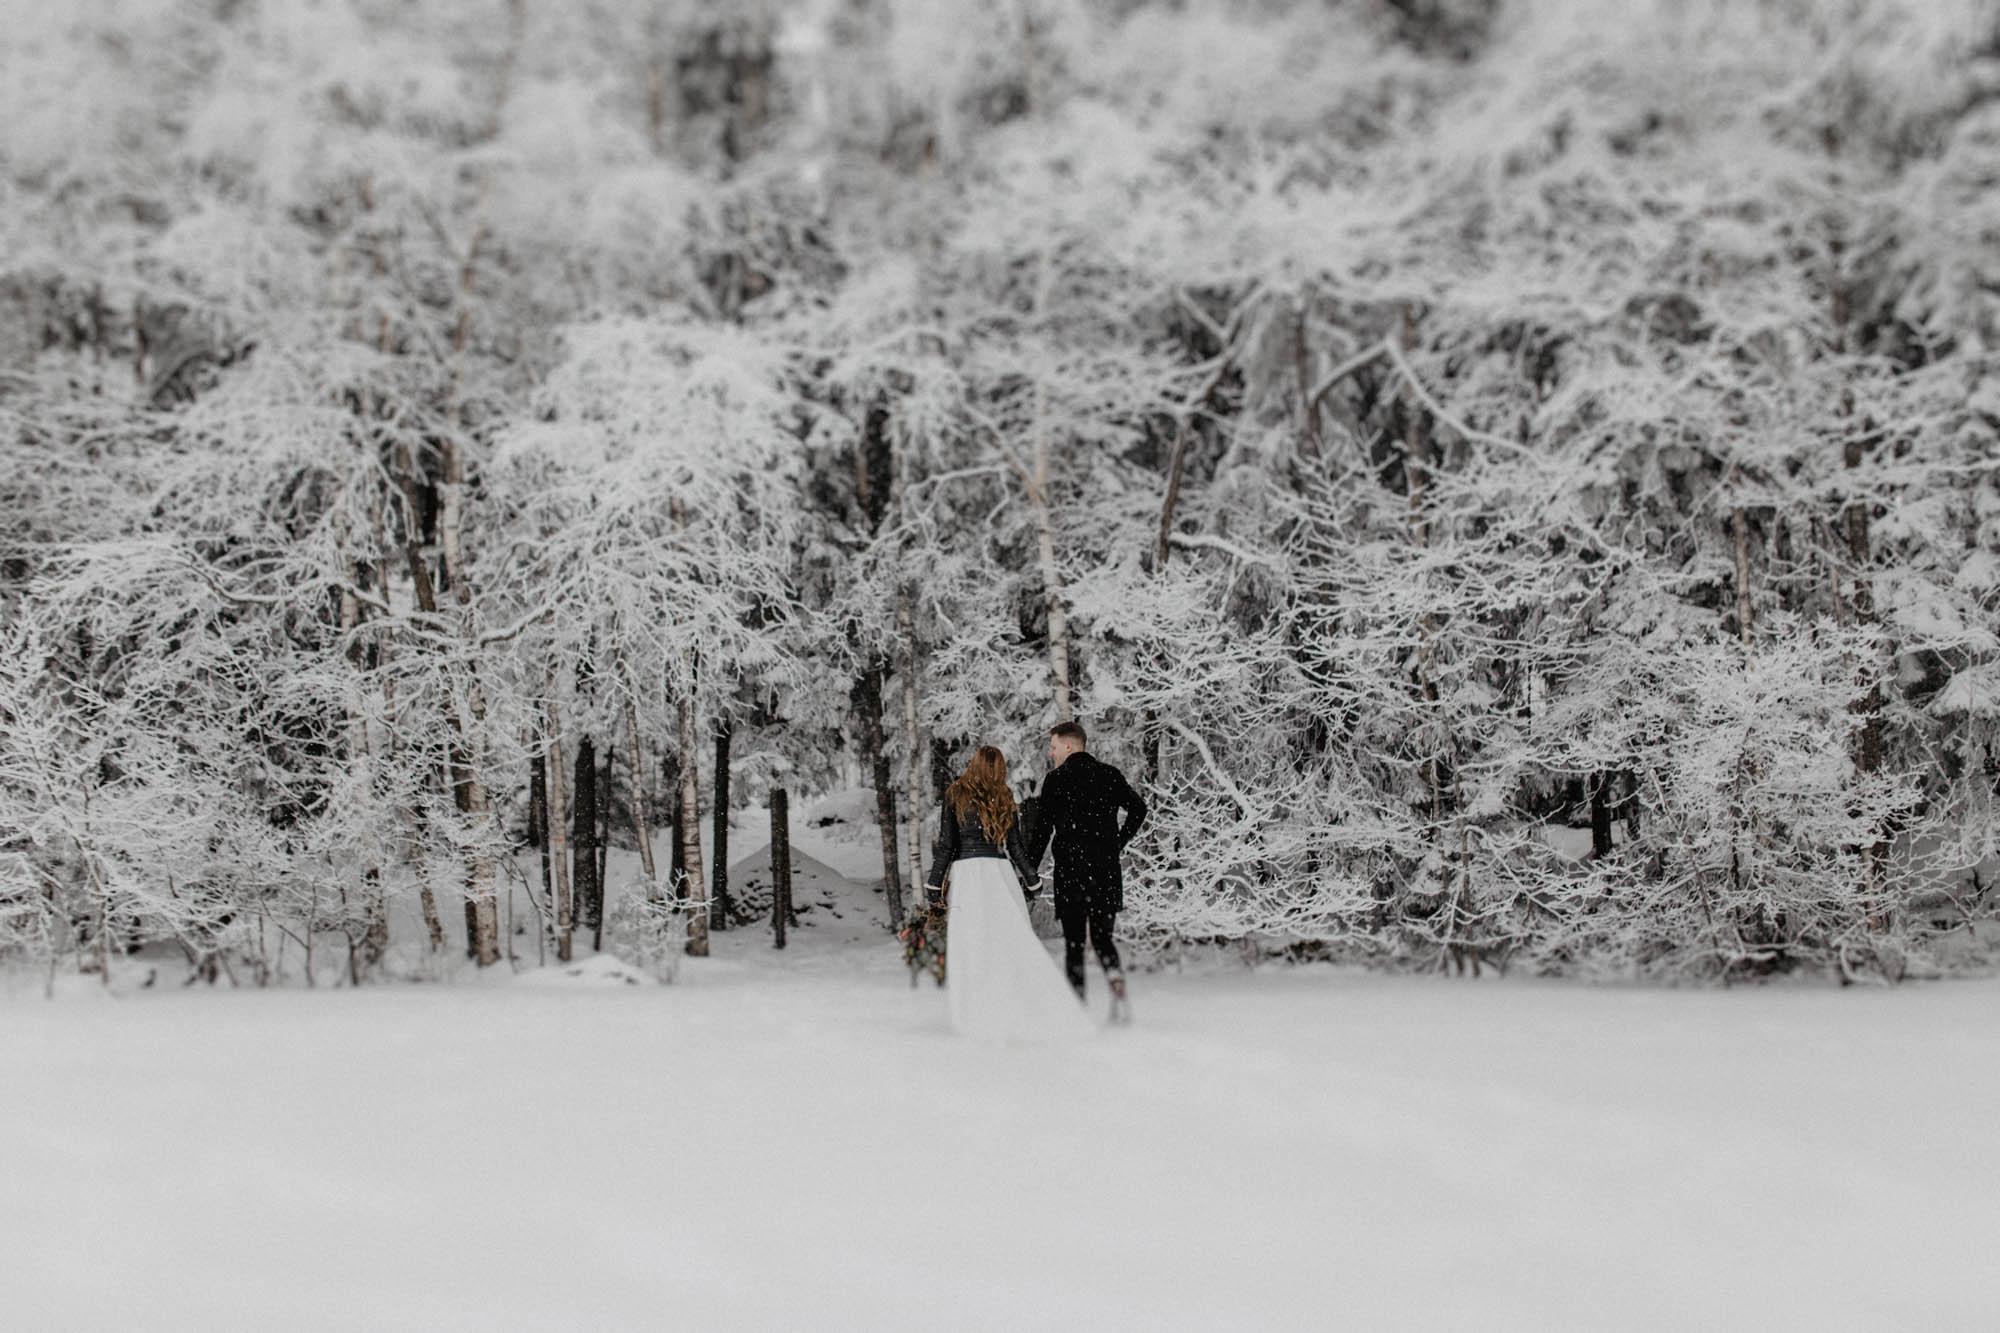 ashley_schulman_photography-winter_wedding_tampere-7.jpg